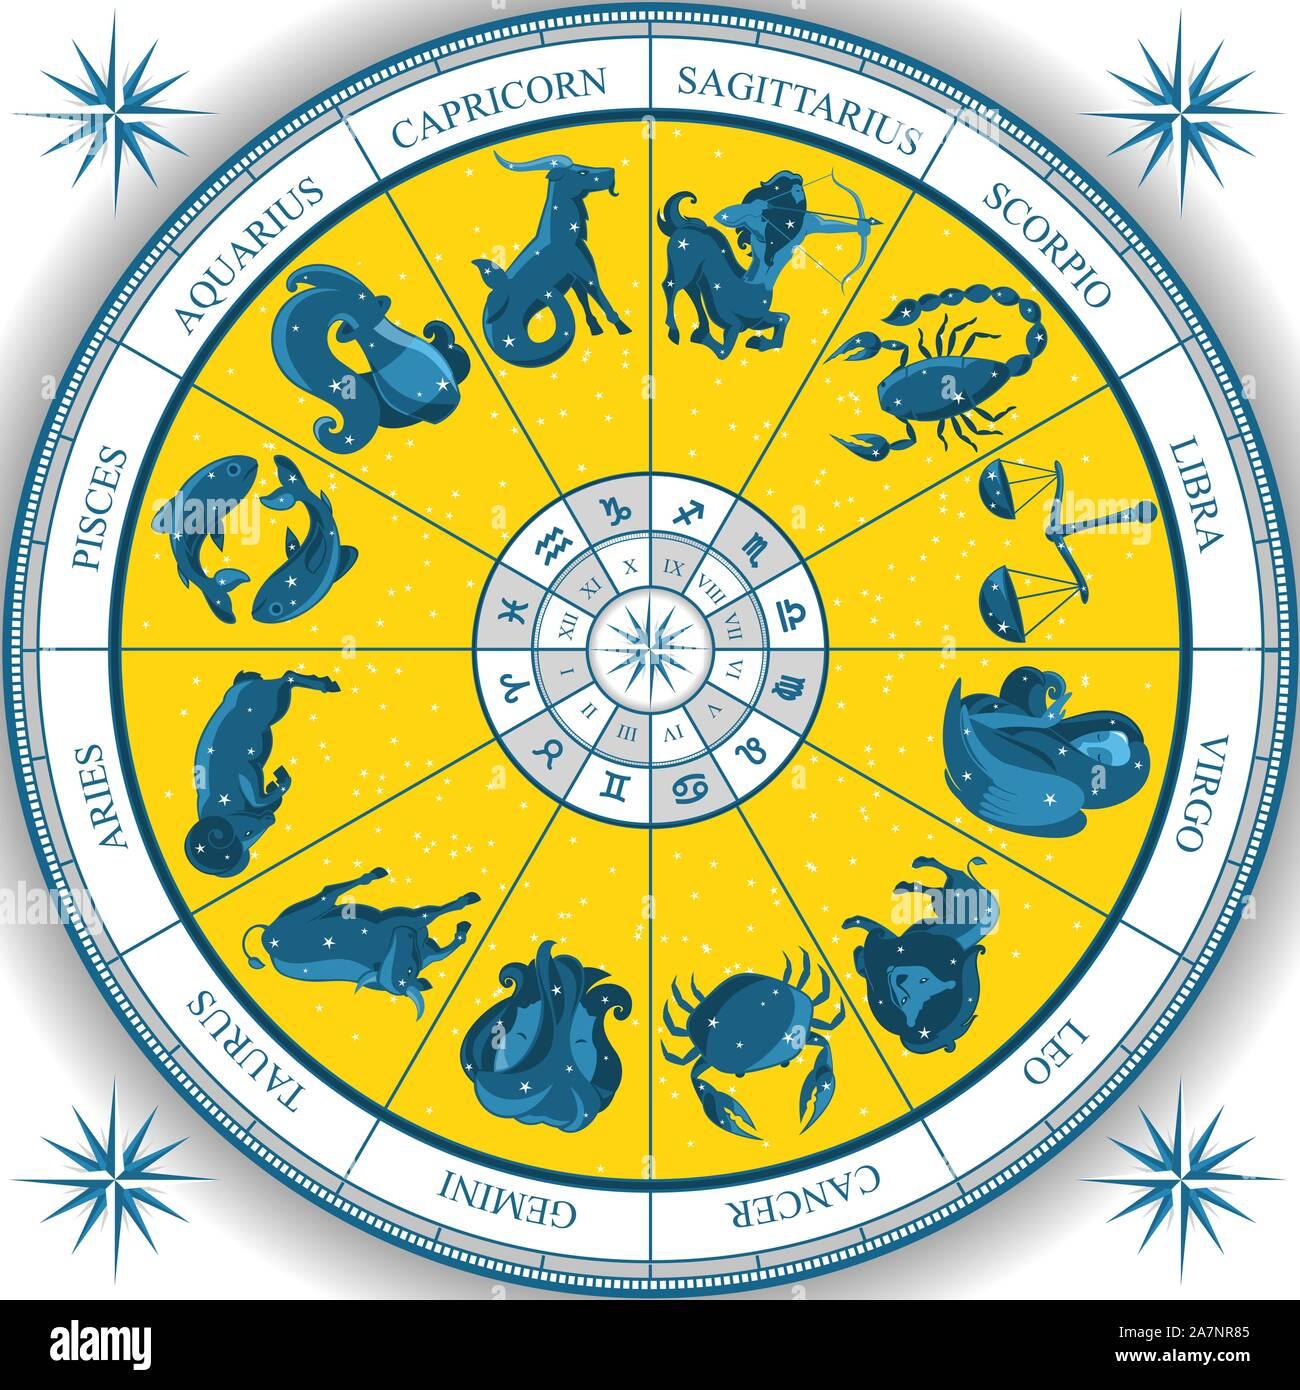 Zodiac Wheel Astrology Natal Chart Stock Vector Image & Art   Alamy